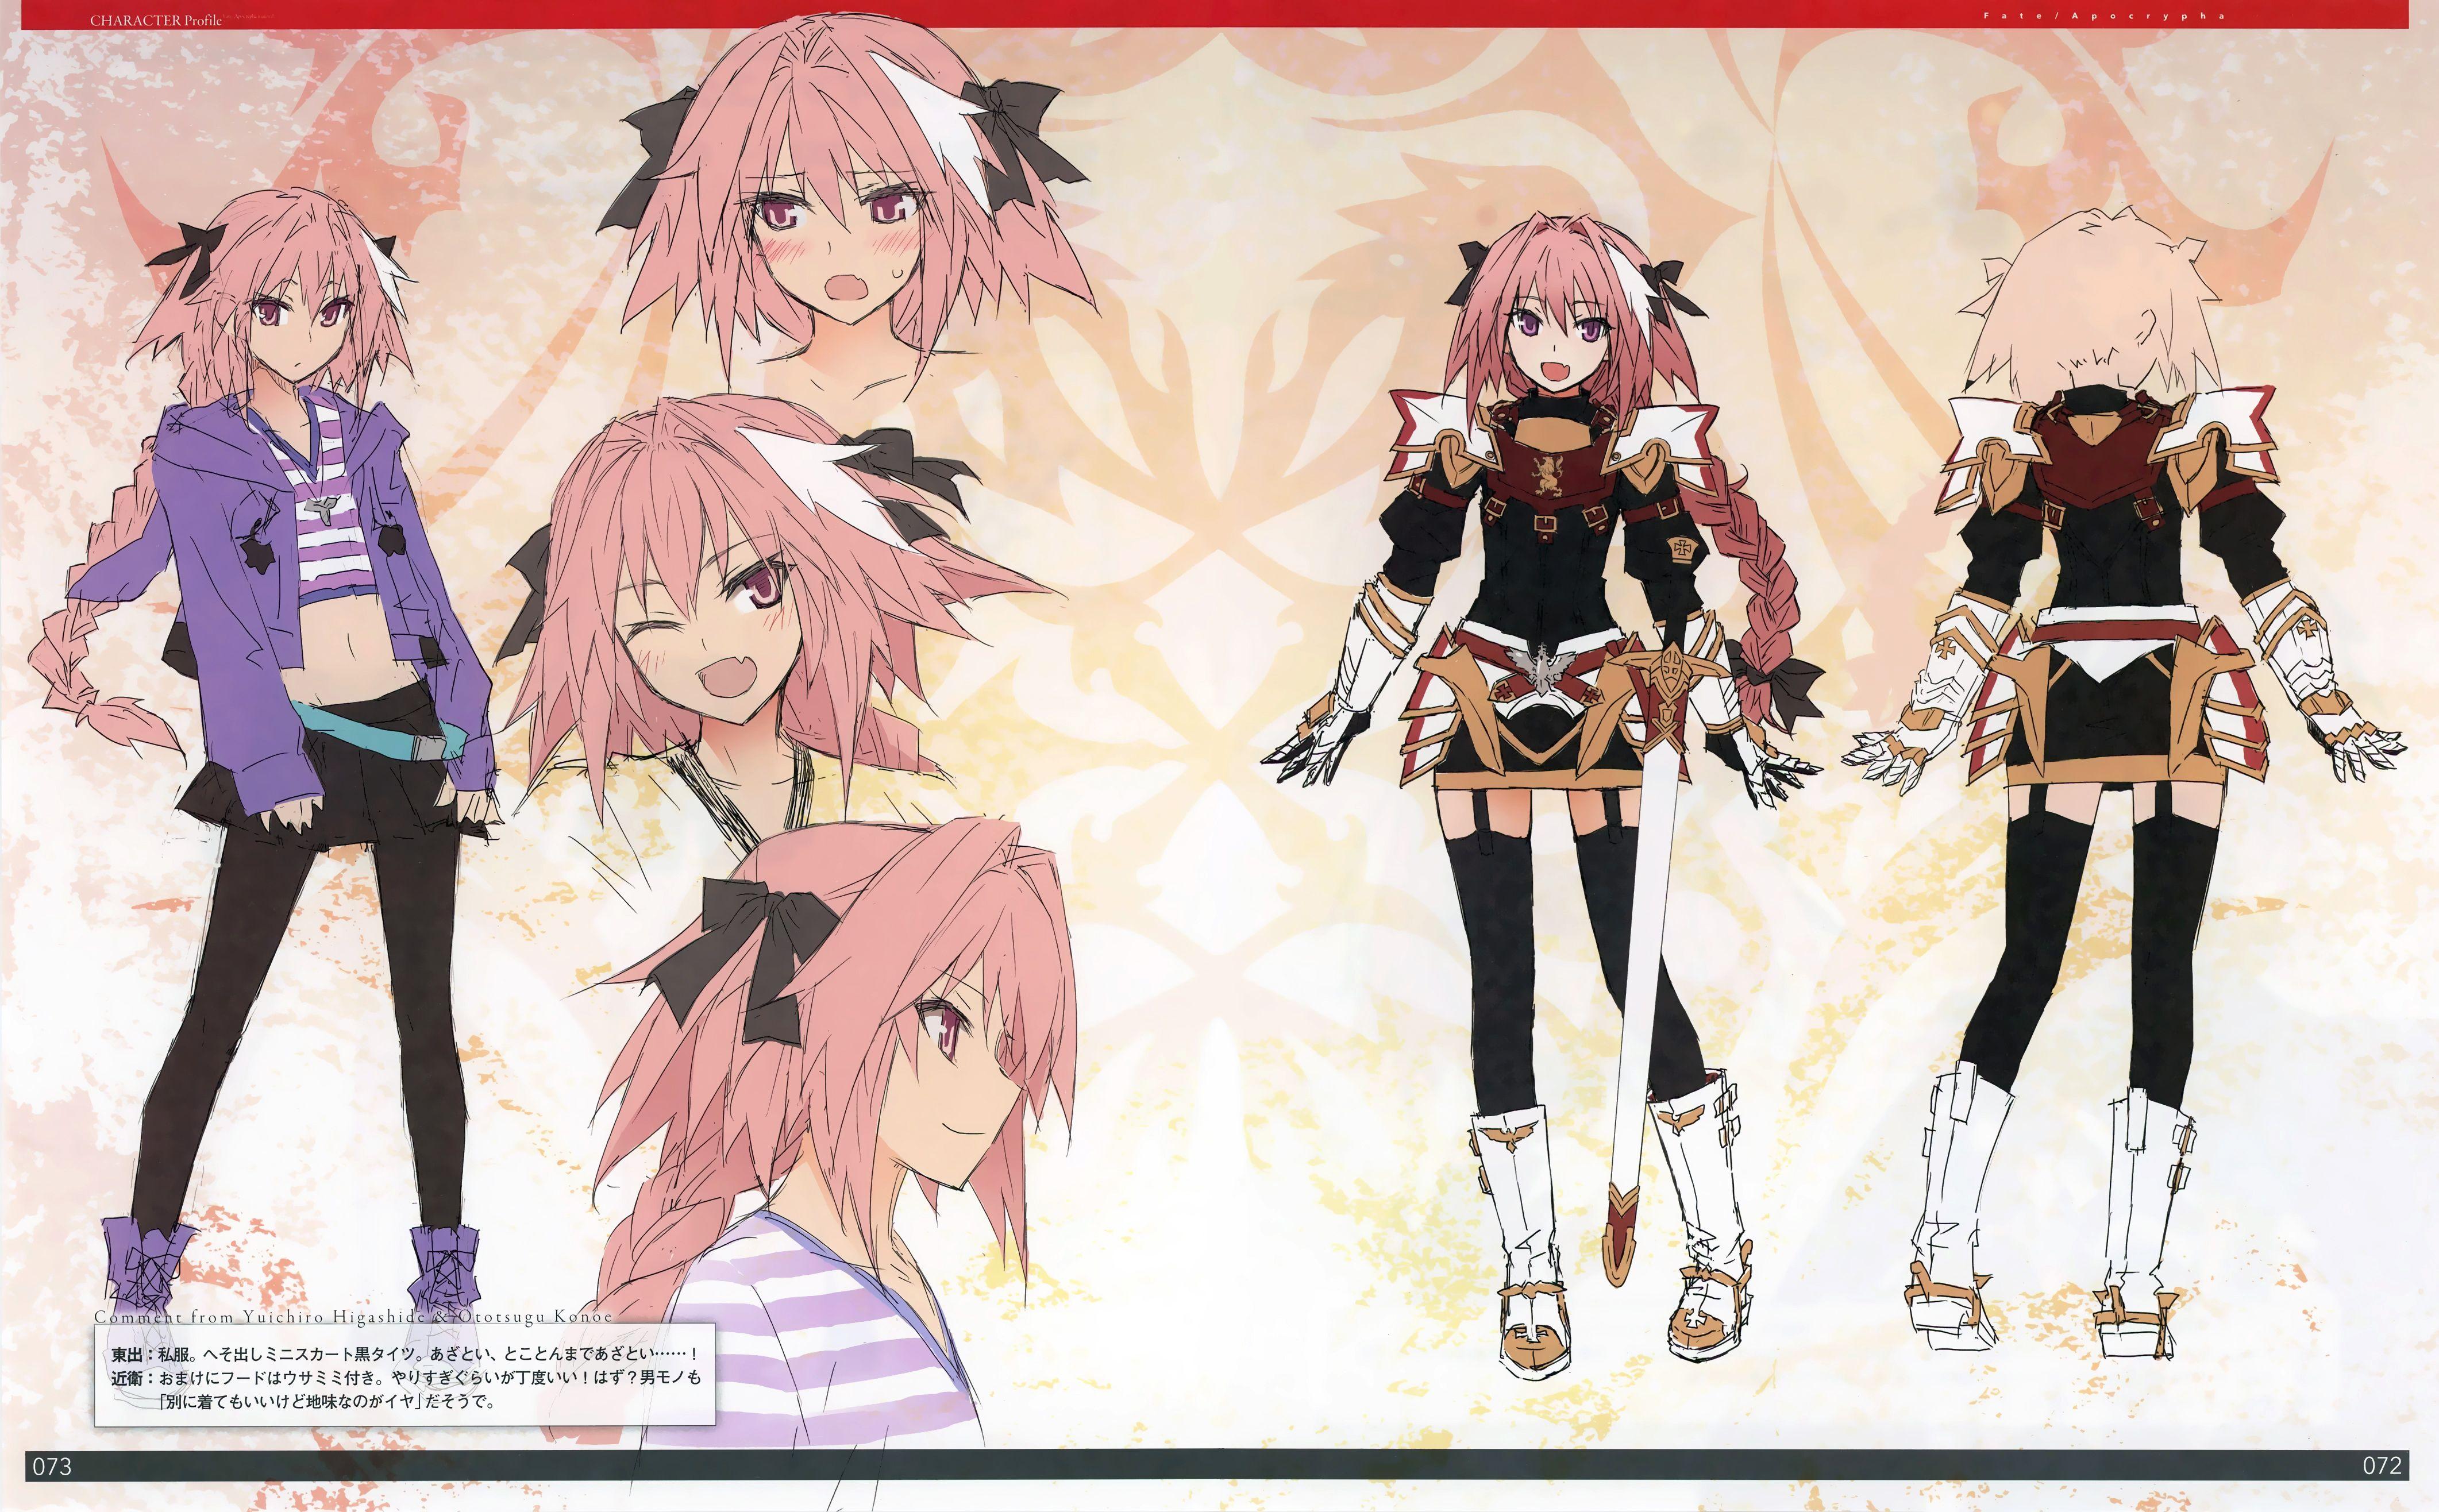 Fate//Grand Order Apocrypha Dakimakura Astolfo Anime Girl Body Pillow Case Cover